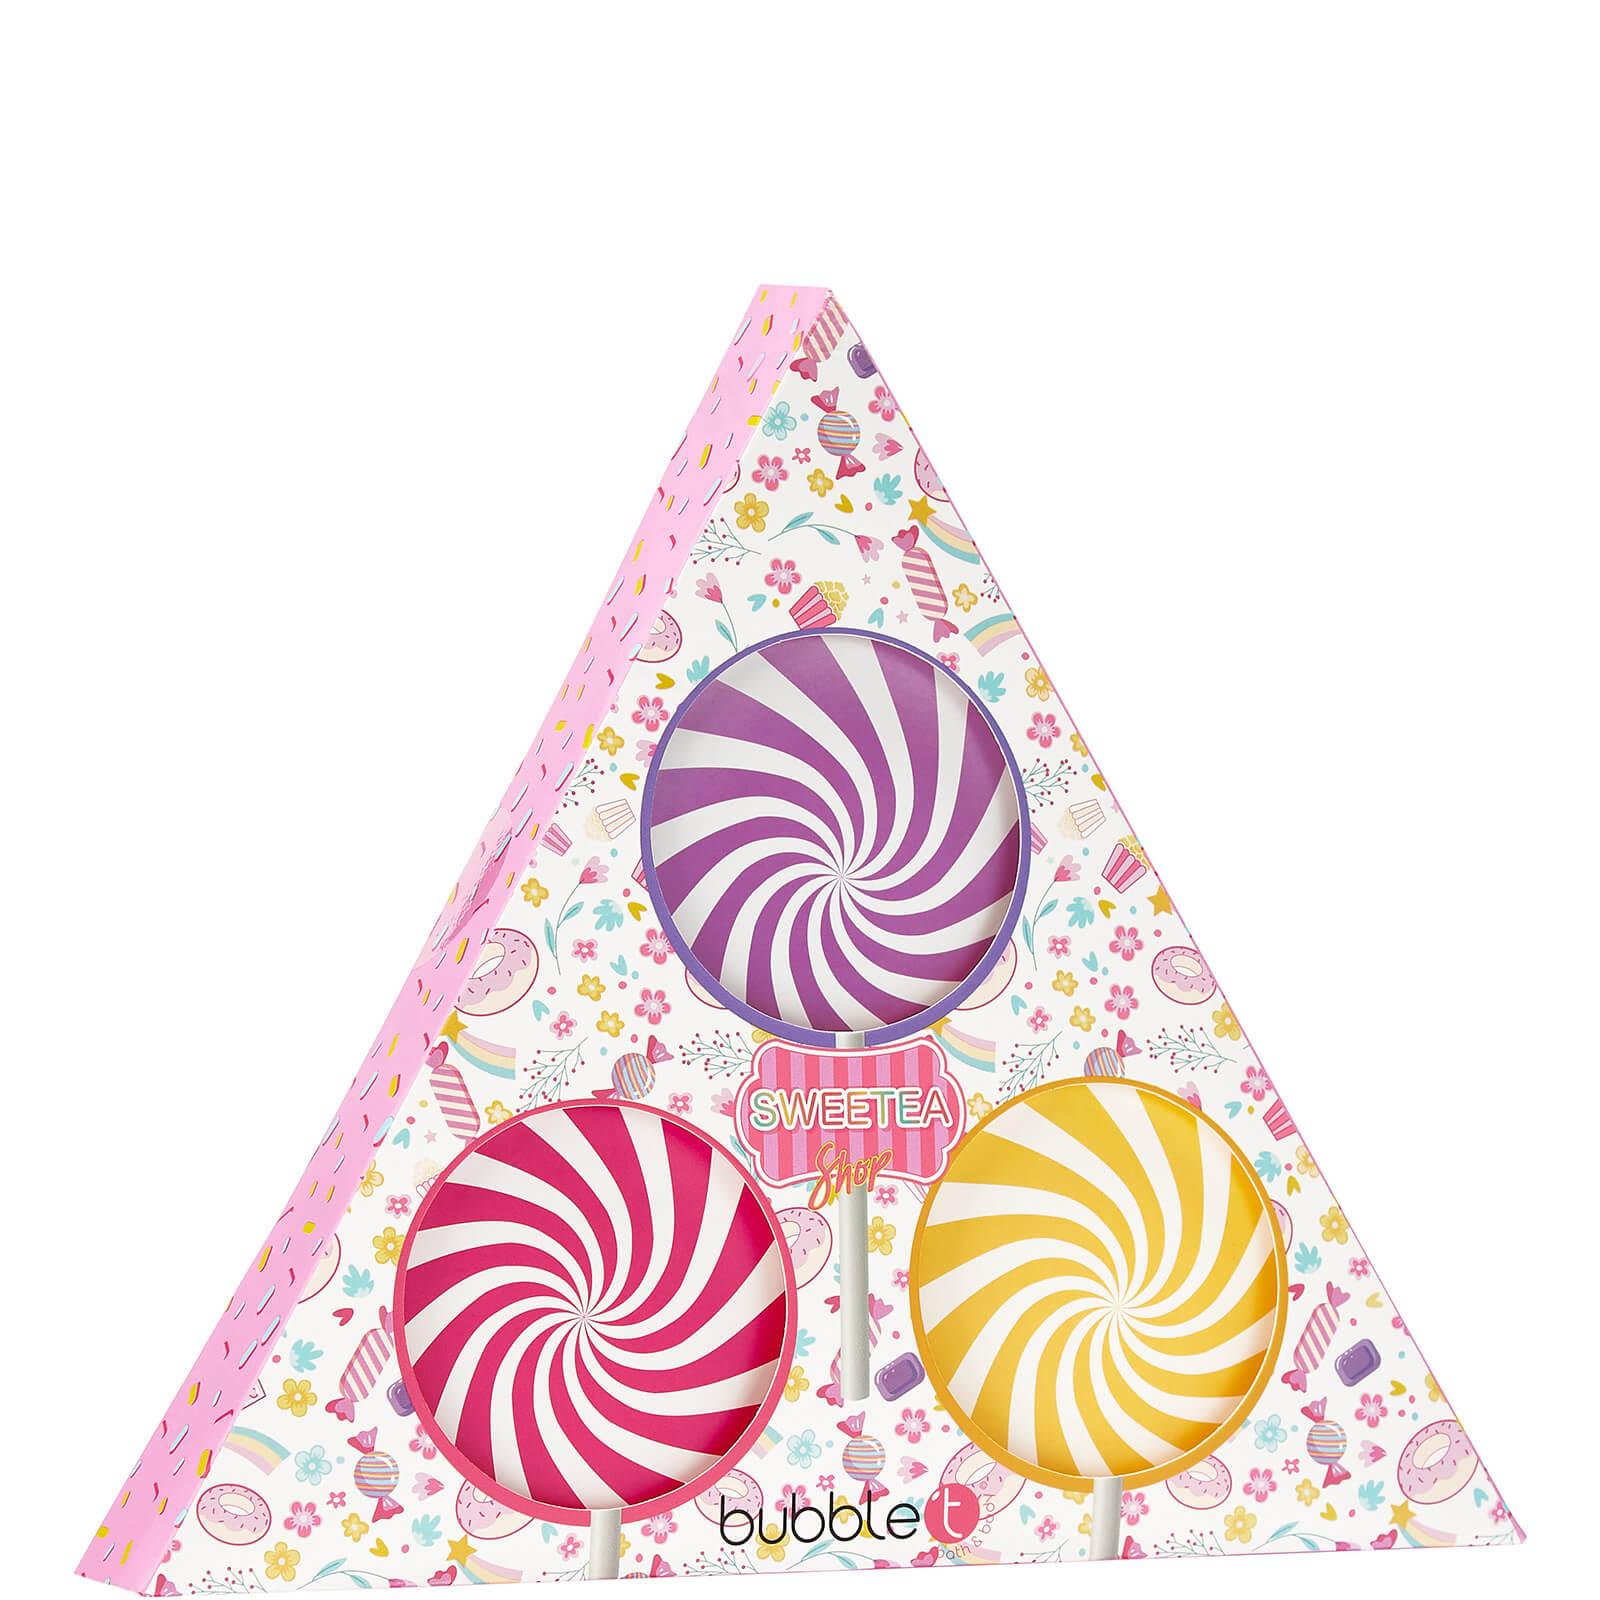 Купить Bubble T Cosmetics Sweetea Lollipop Bath Fizzer Gift Set